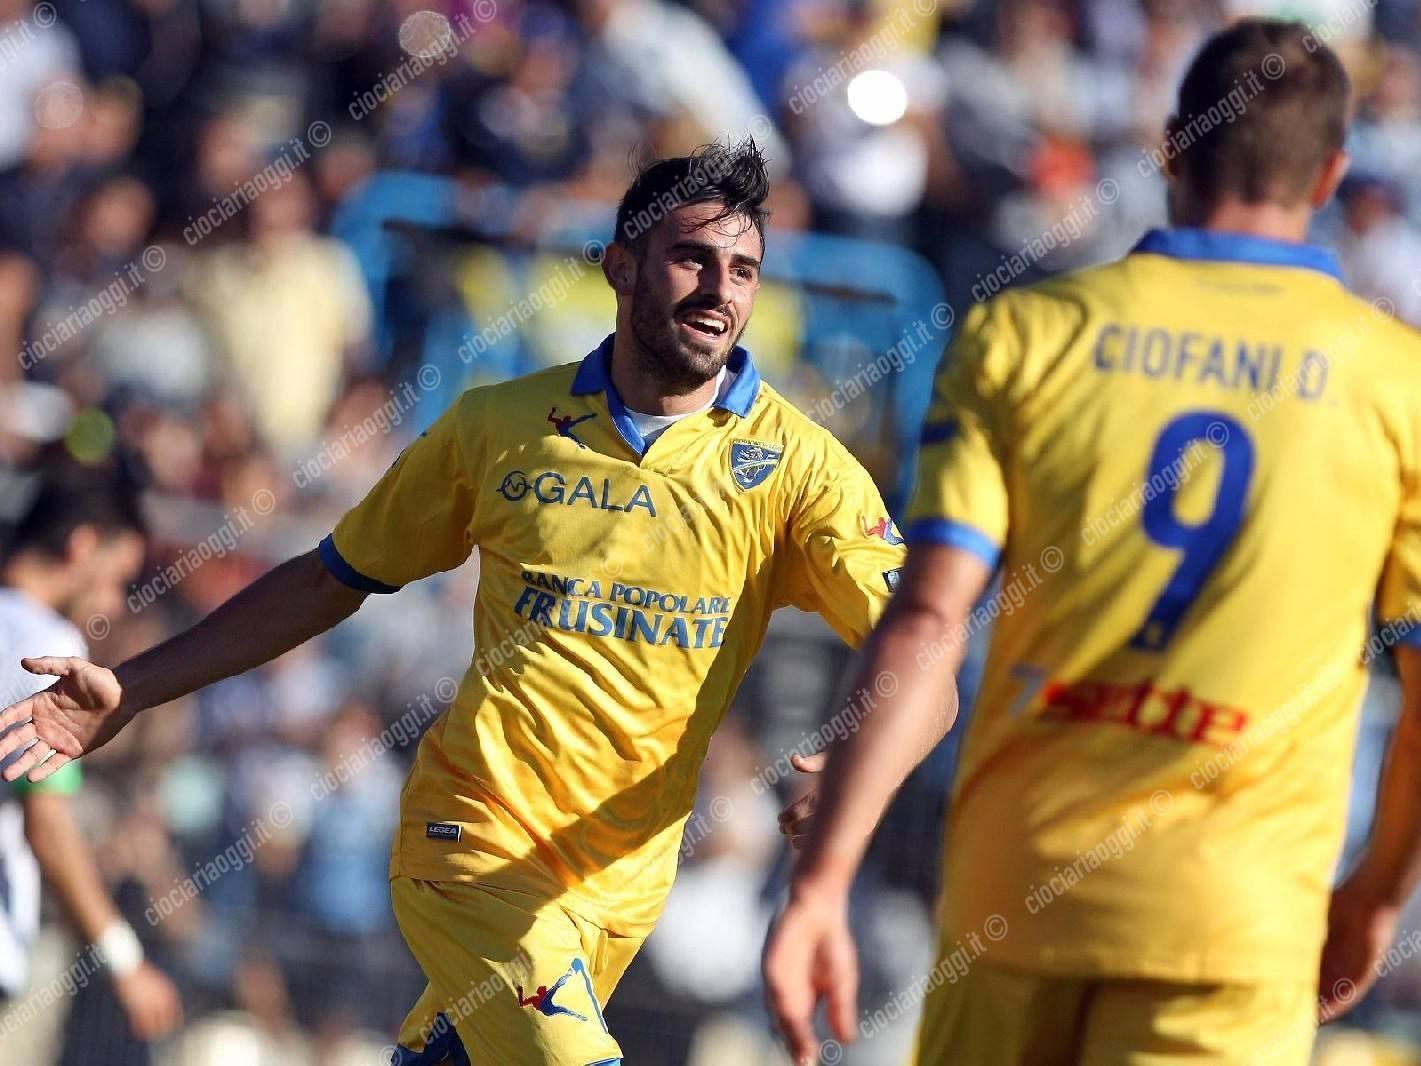 Serie B Cesena-Frosinone 1-1: Mokulu risponde a Cocco nel finale